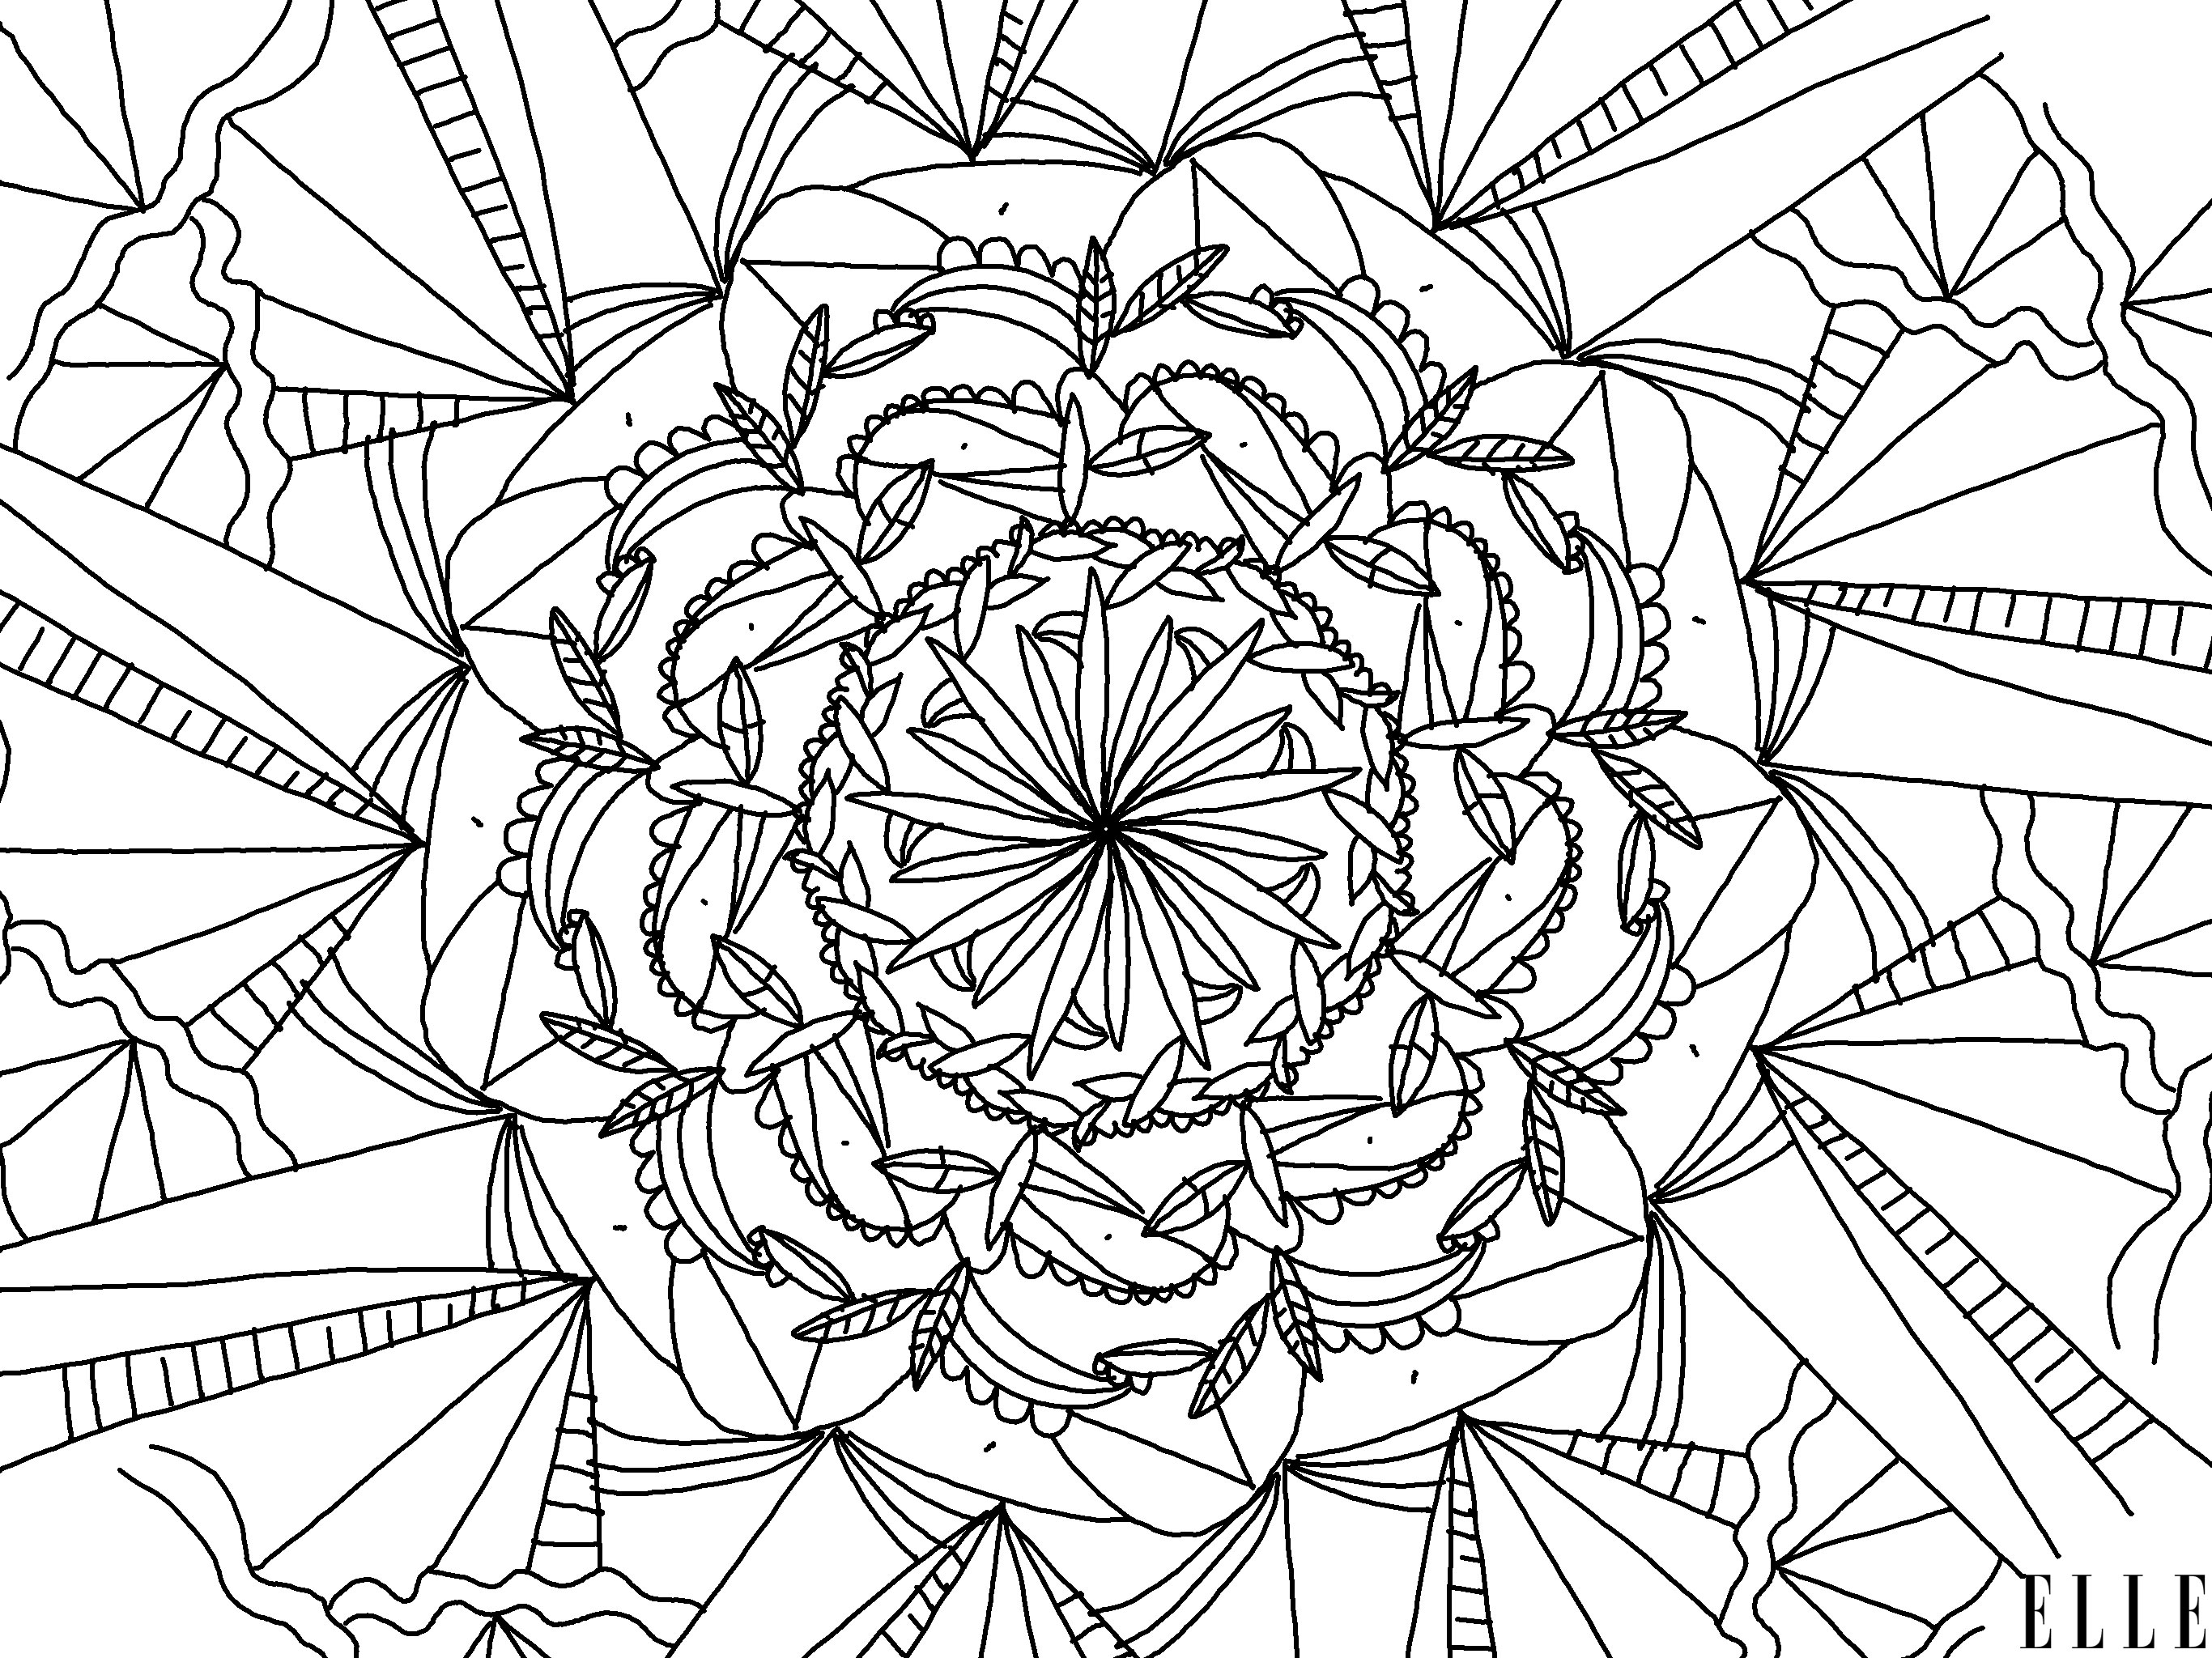 Mandala A Imprimer Telechargez 4 Coloriages Mandala A Imprimer Elle